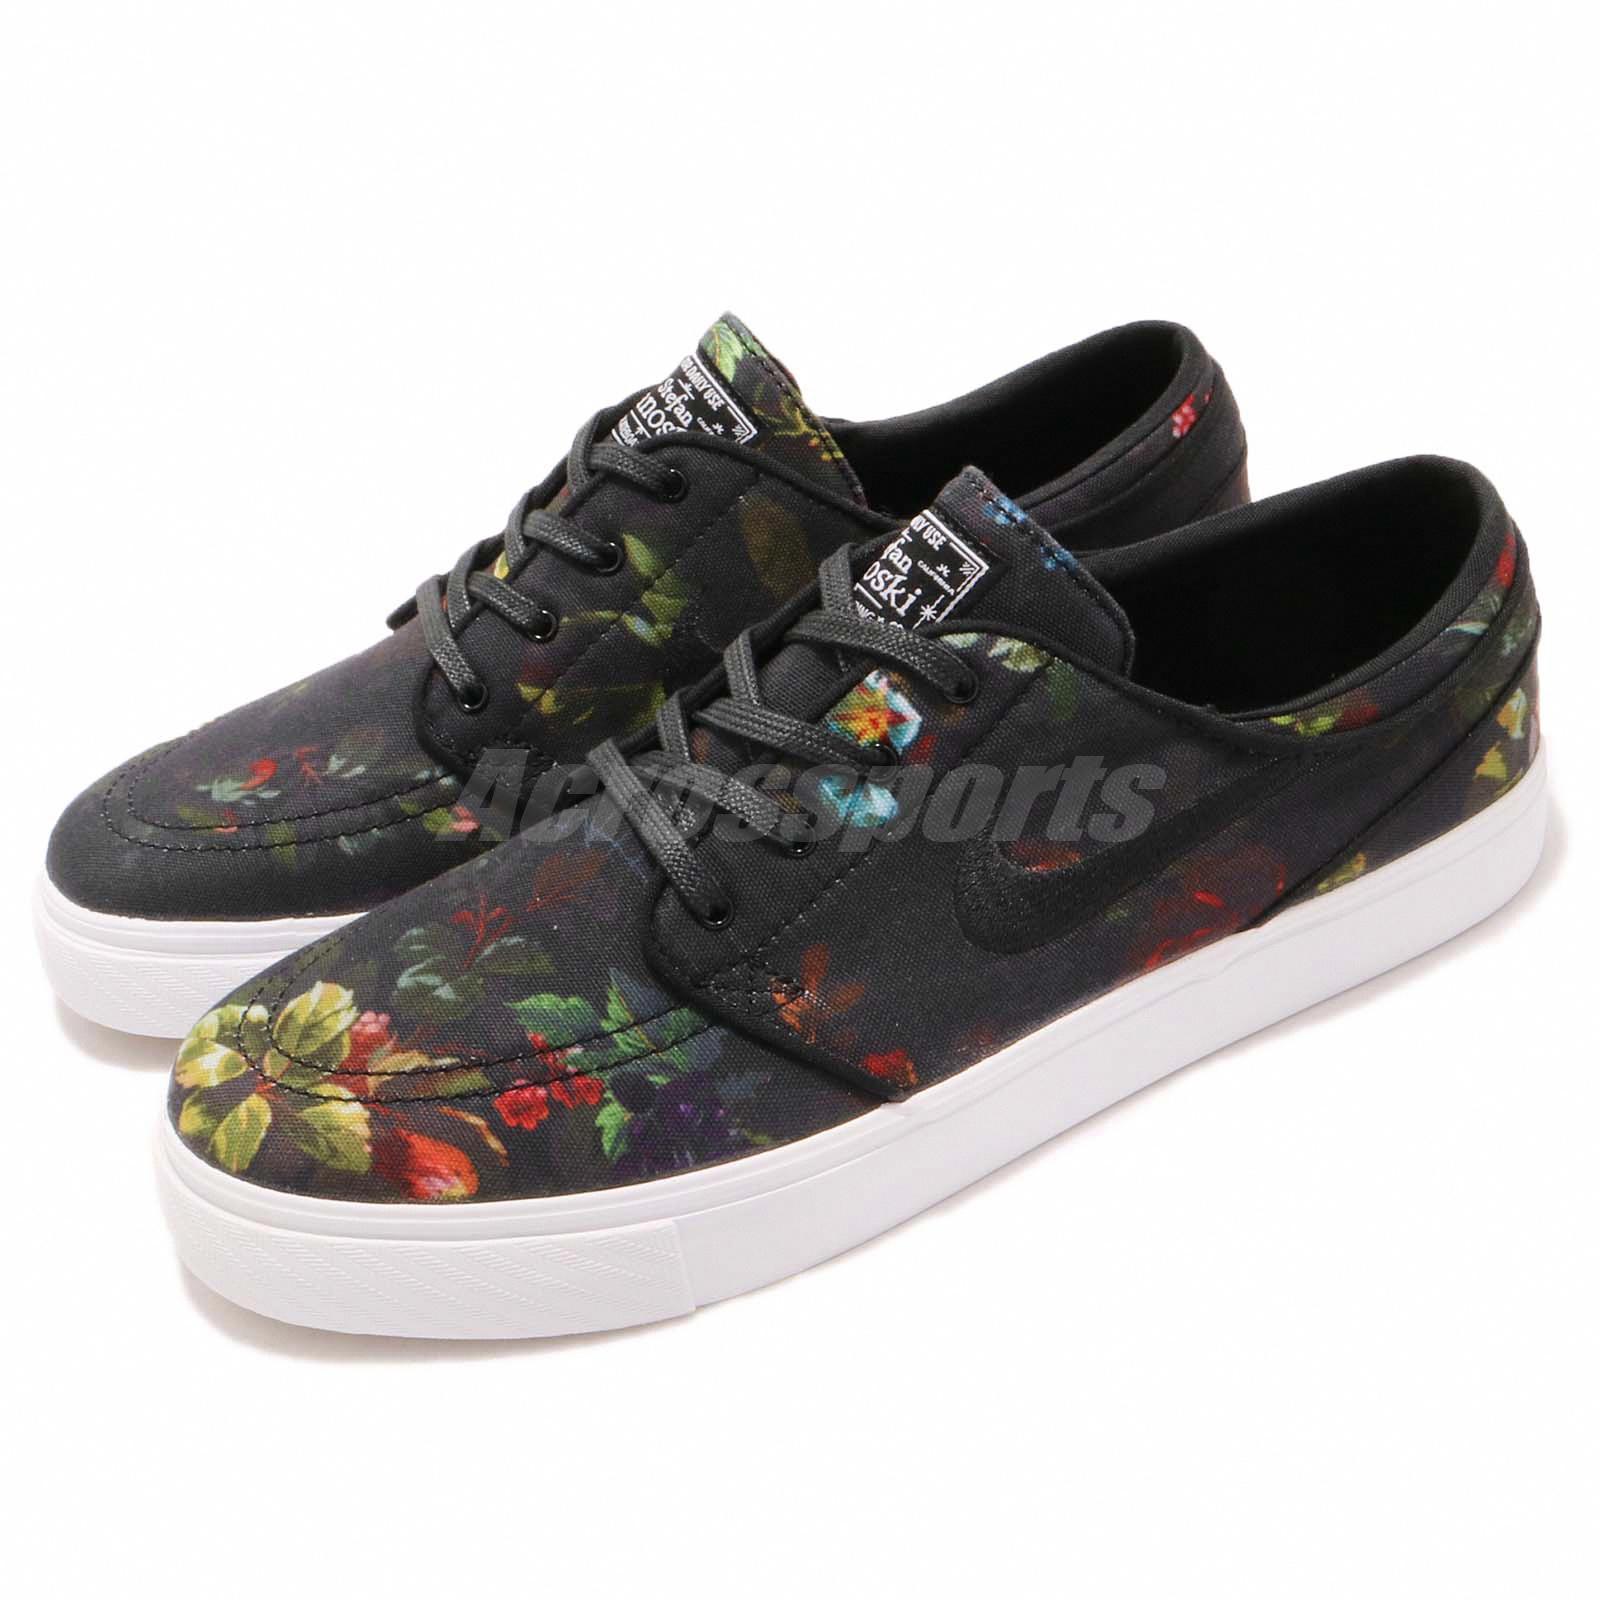 best service 42eca e3beb Details about Nike SB Zoom Stefan Janoski Canvas Black Floral Skateboarding  Shoes 615957-900